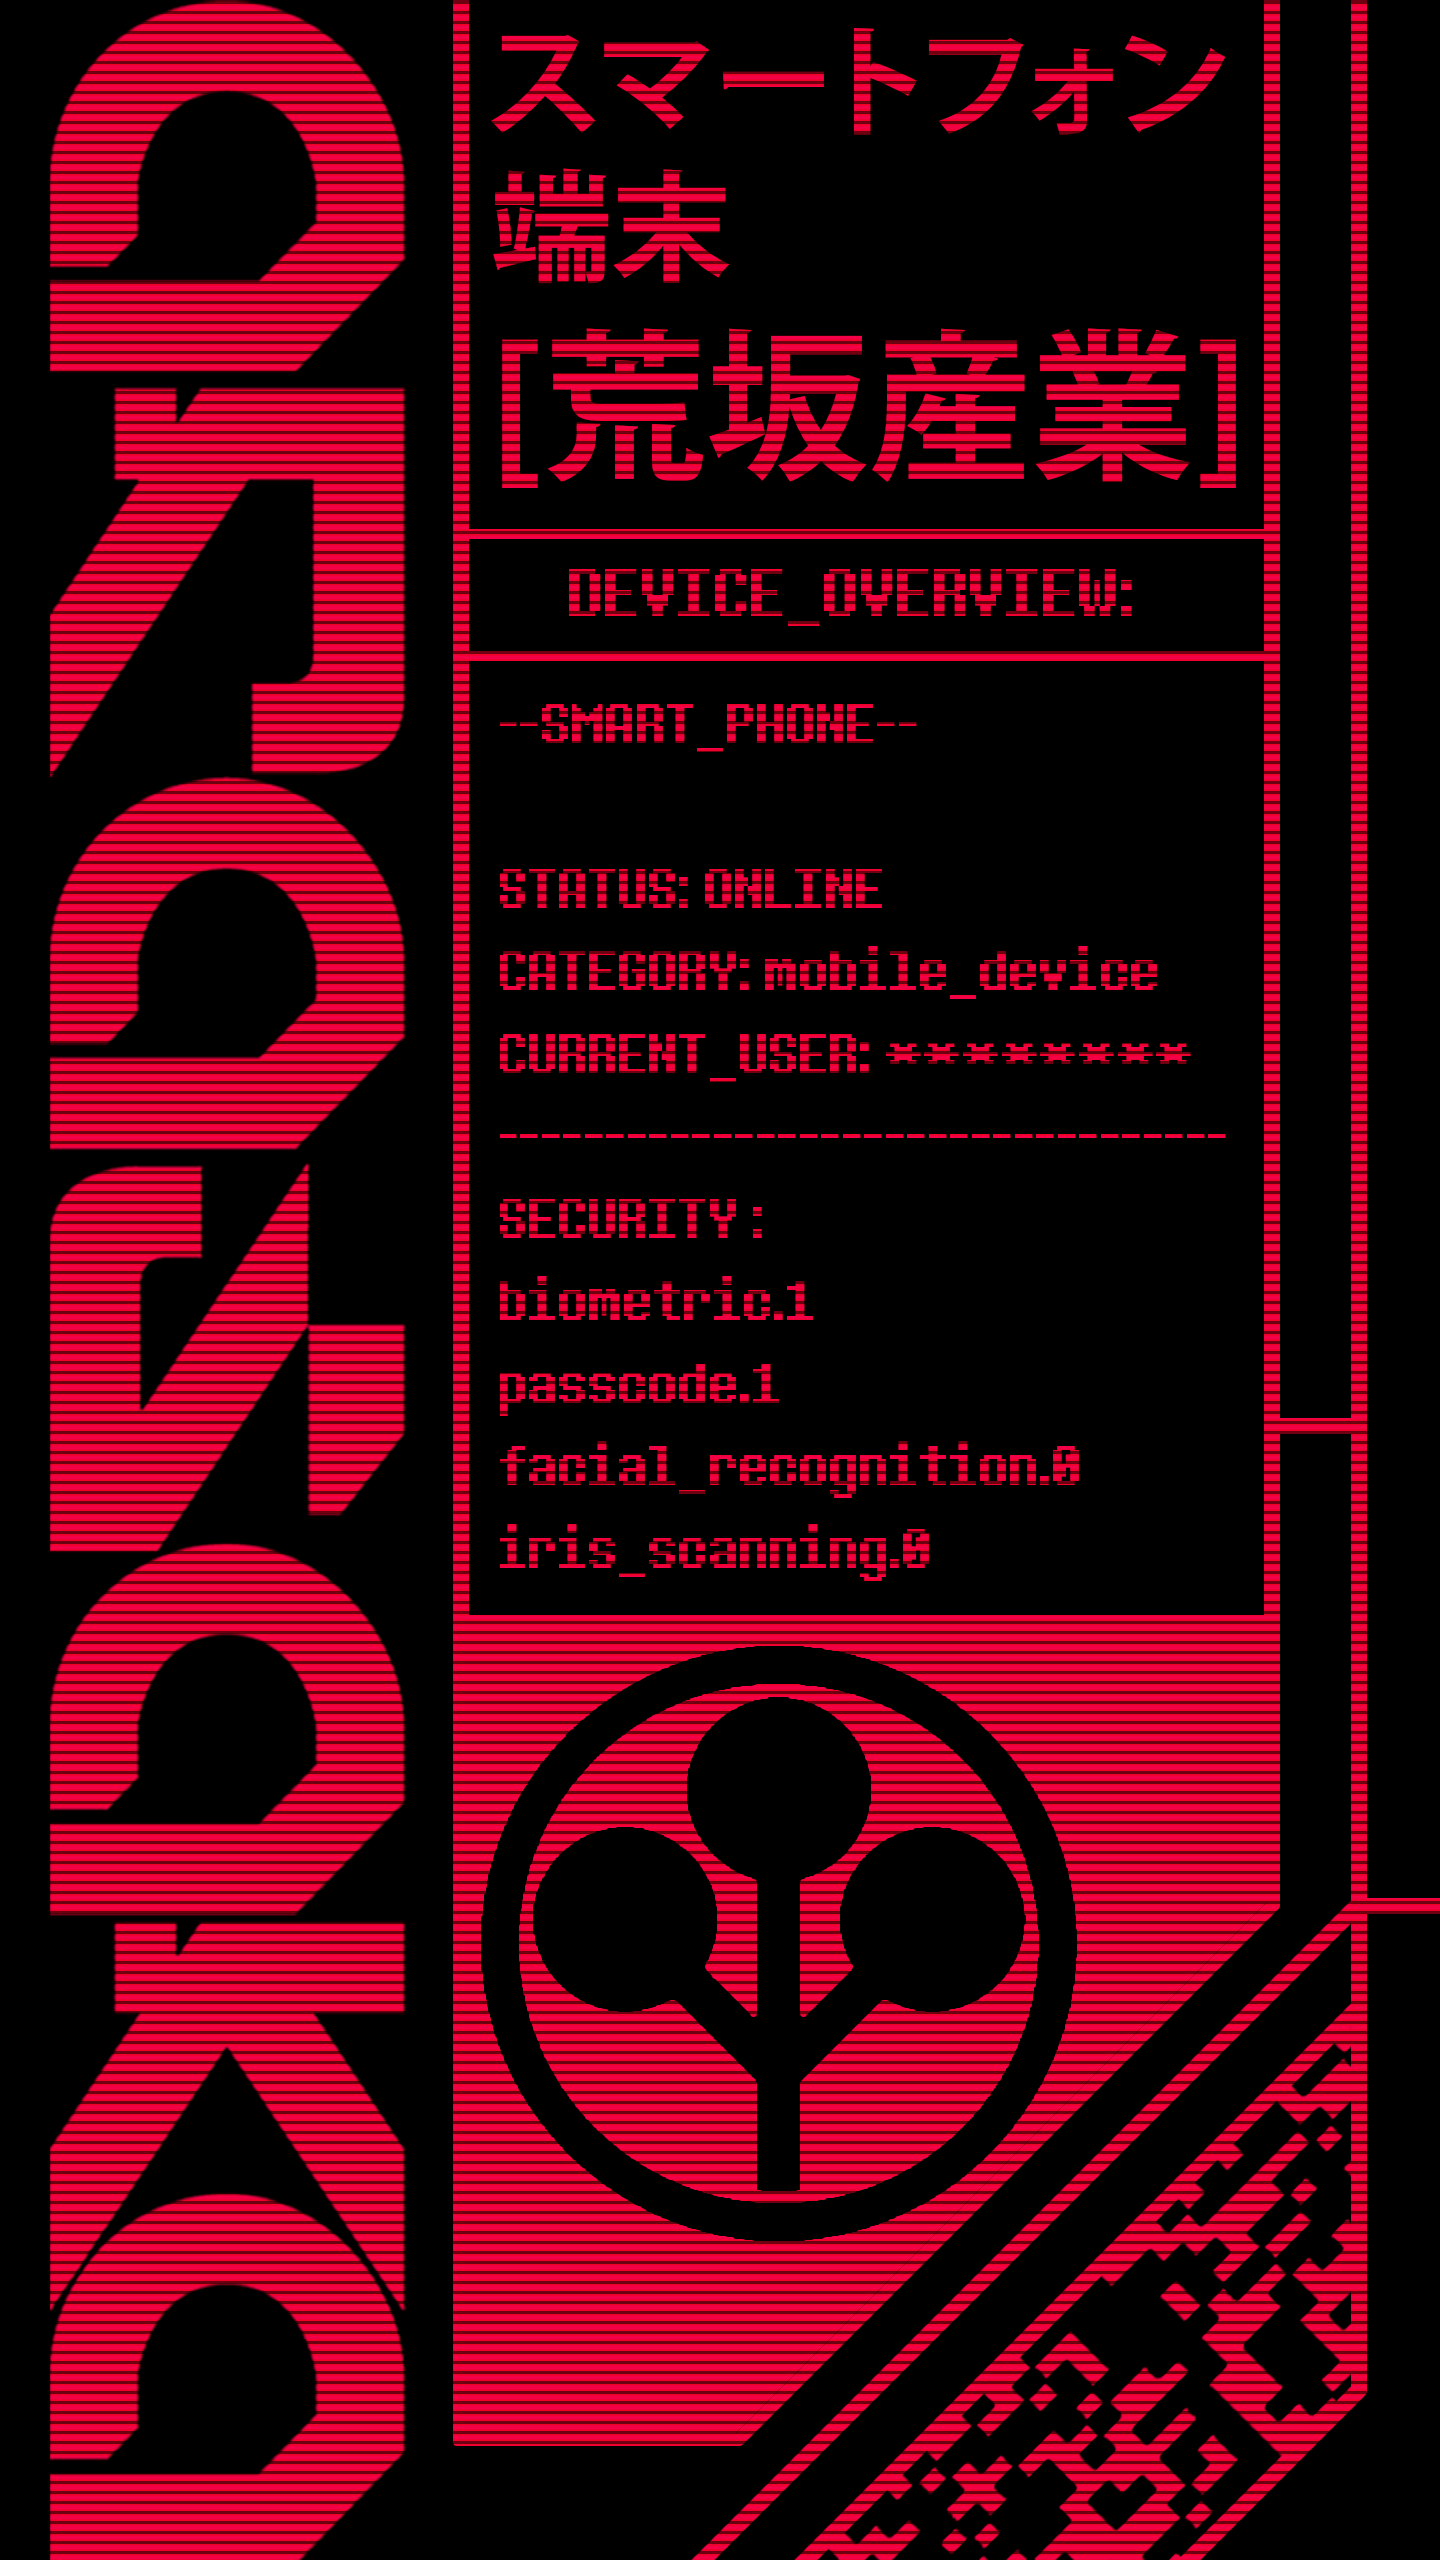 Cyberpunk 2077 Phone Wallpapers - Wallpaper Cave